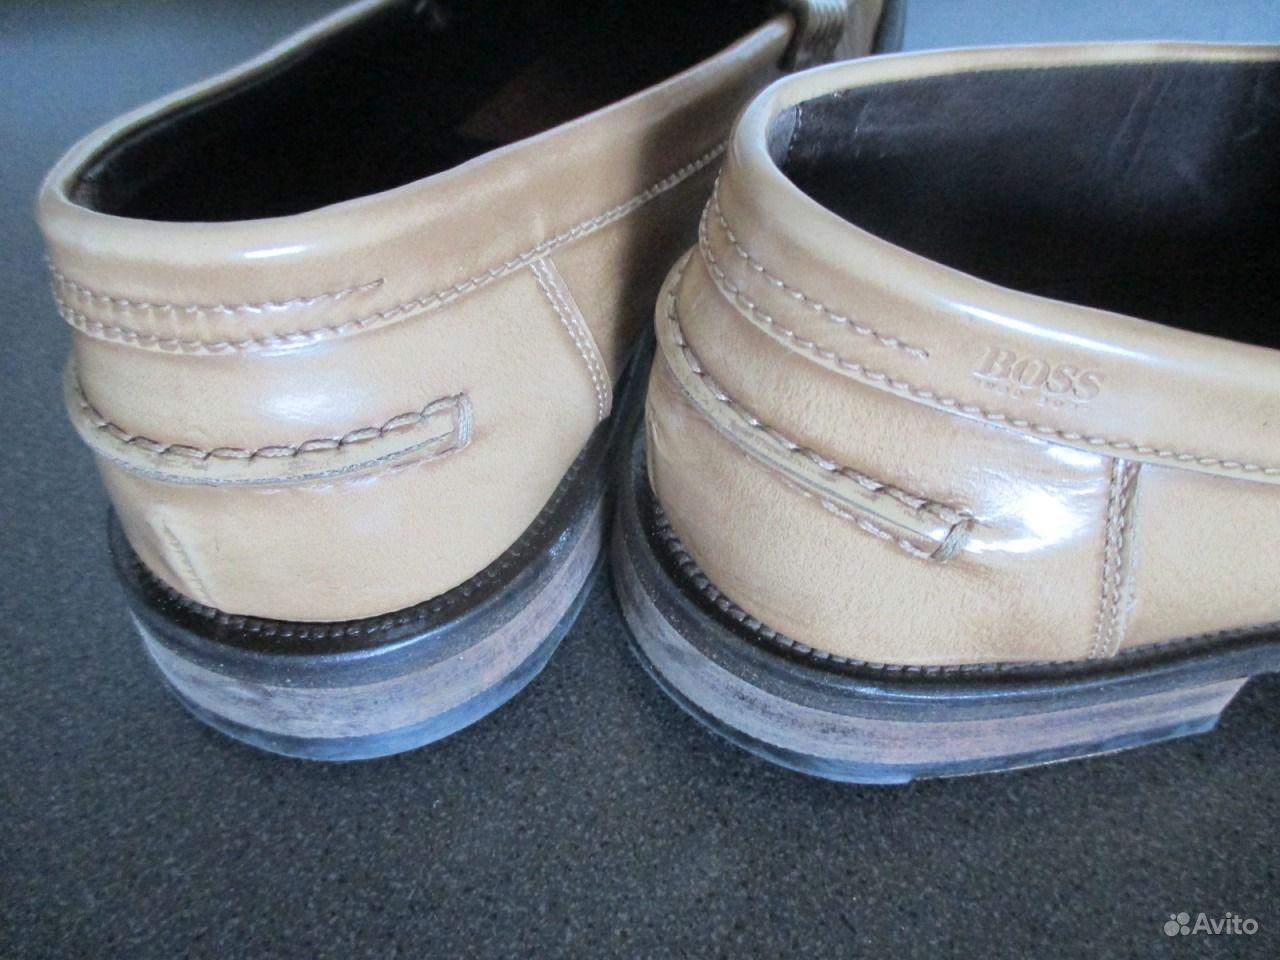 e7f478913 Авито новосибирск туфли бу конец ниток узелком